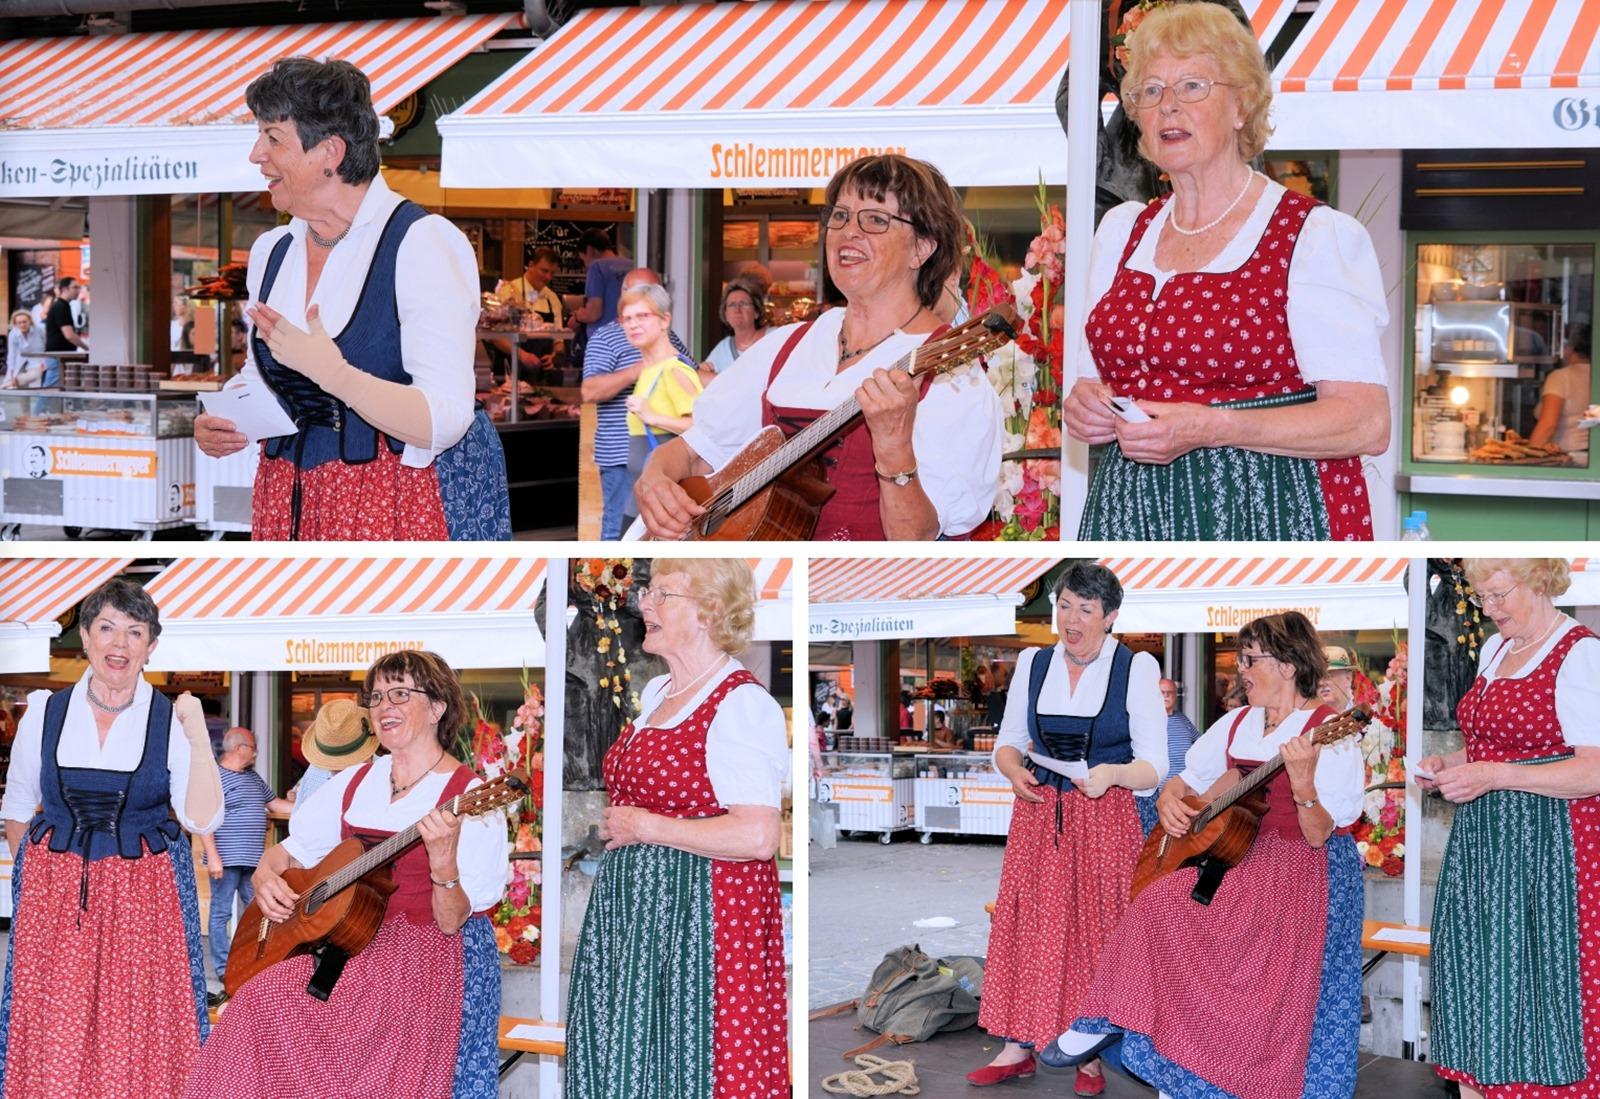 Quittengsangl mit Carmen Kühnl, Christl Paretzke und Cläre